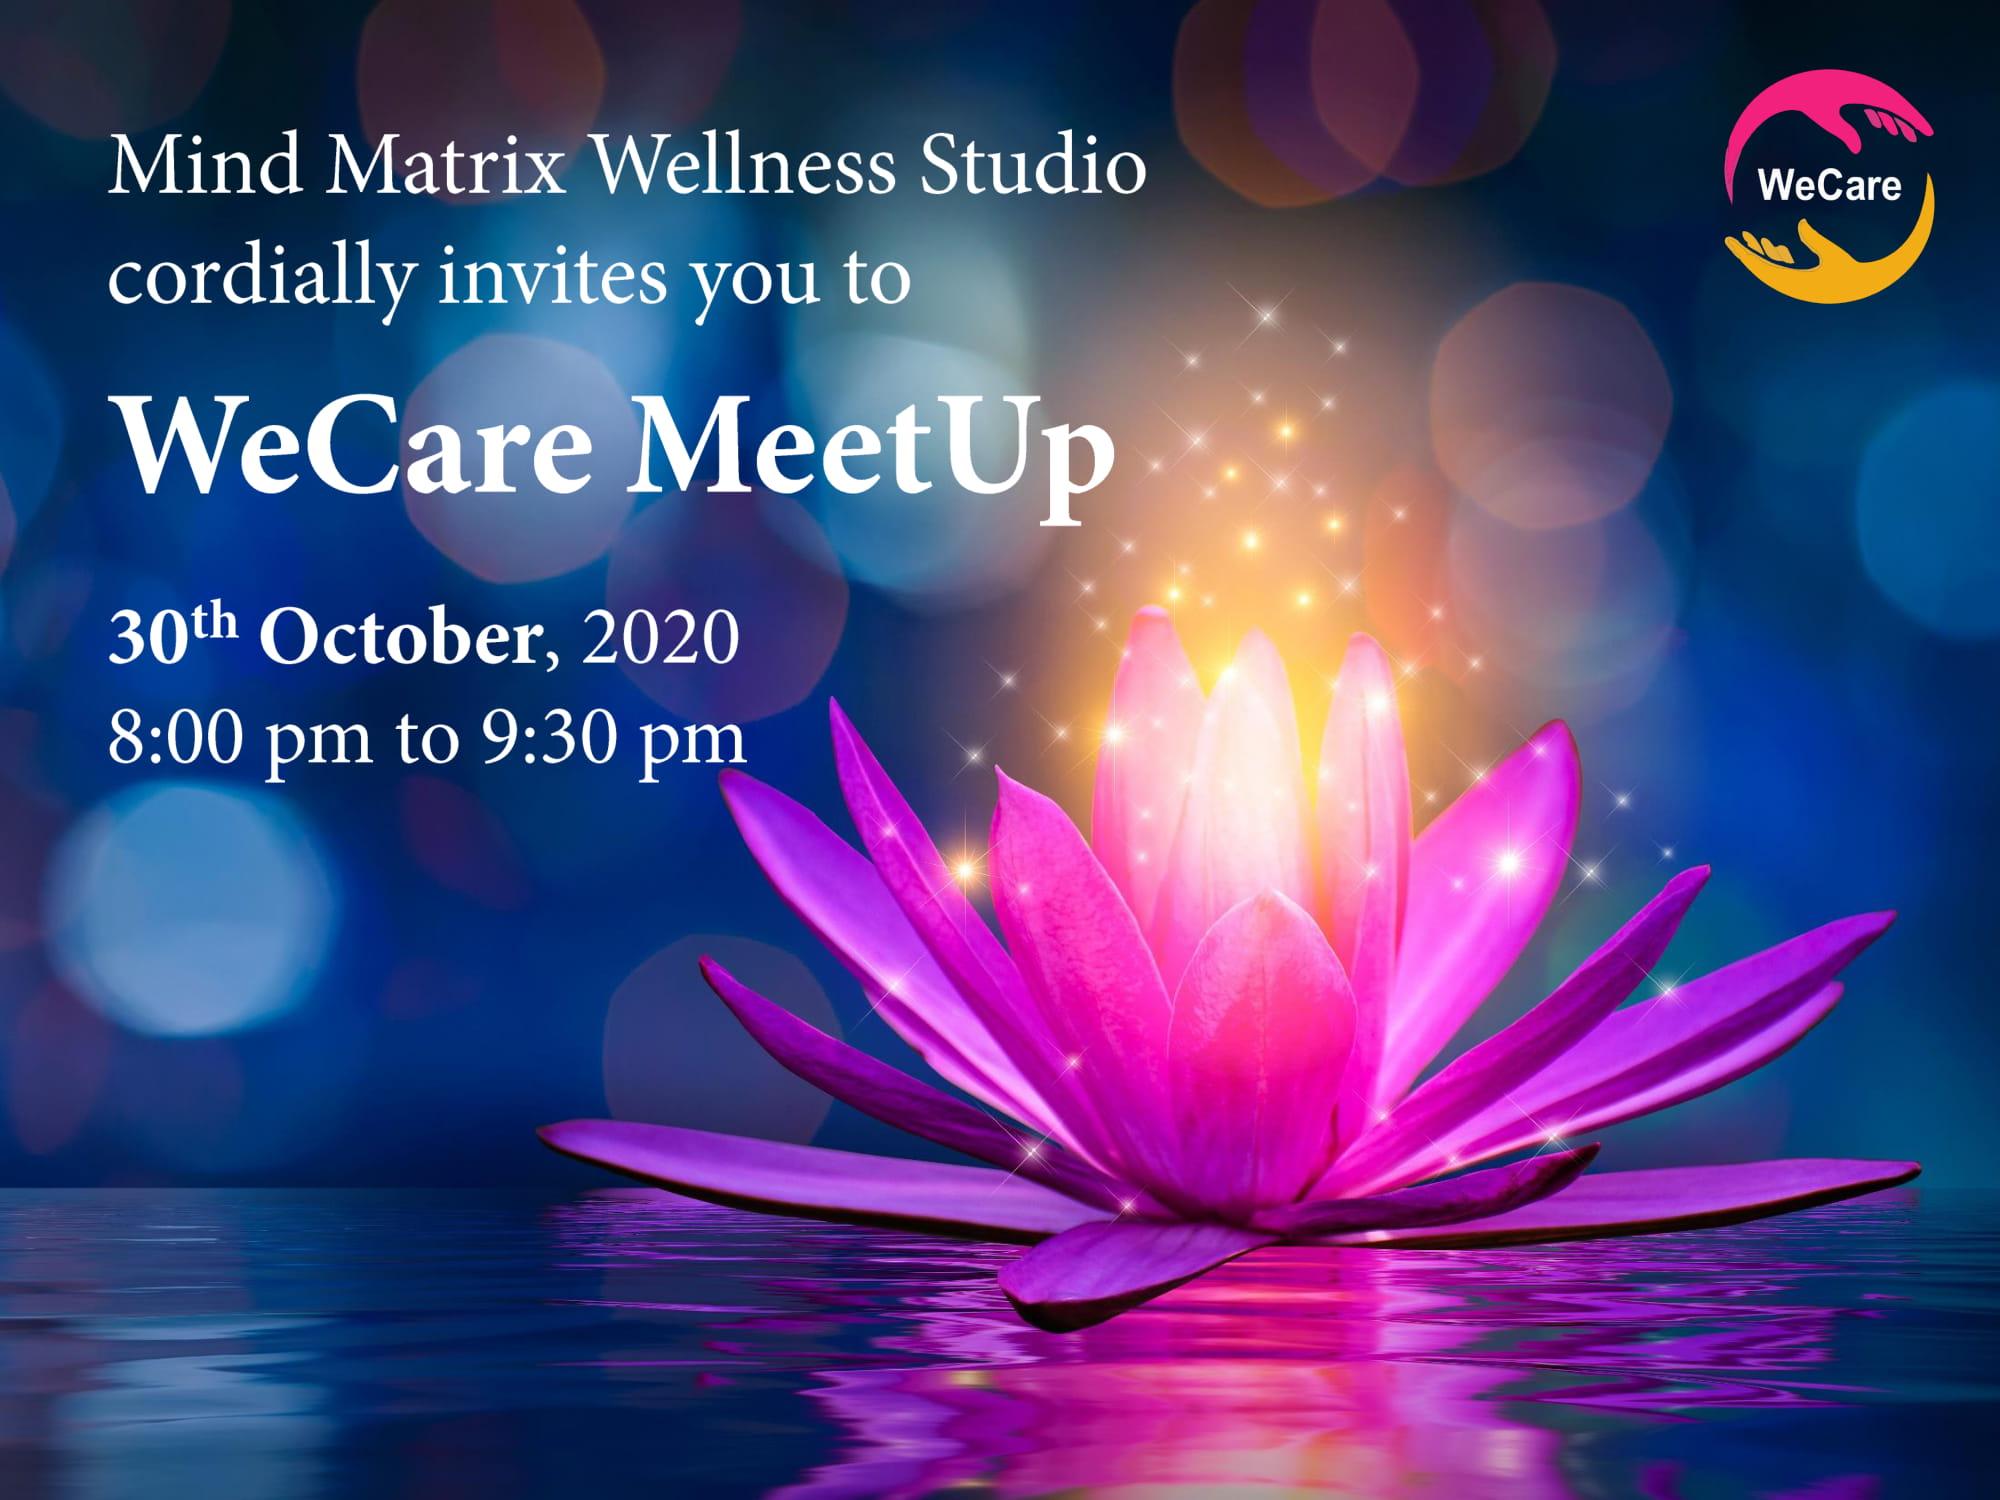 Invitation - WeCare MeetUp - 30th October, 2020-1